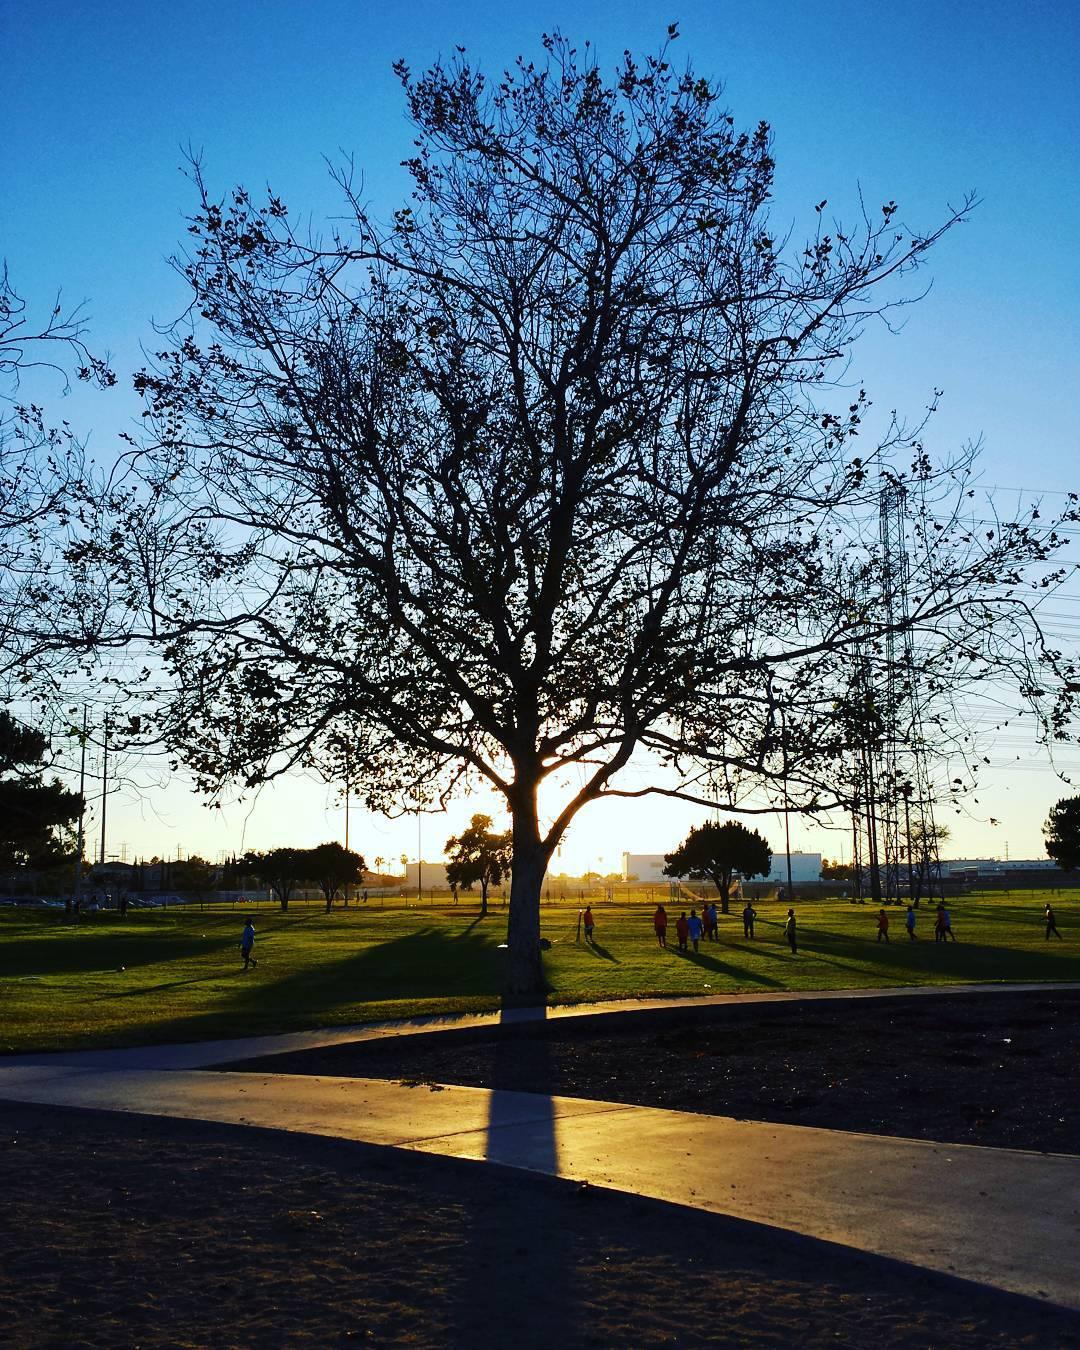 Tree at sunset.  #silhouette #tree #sunset